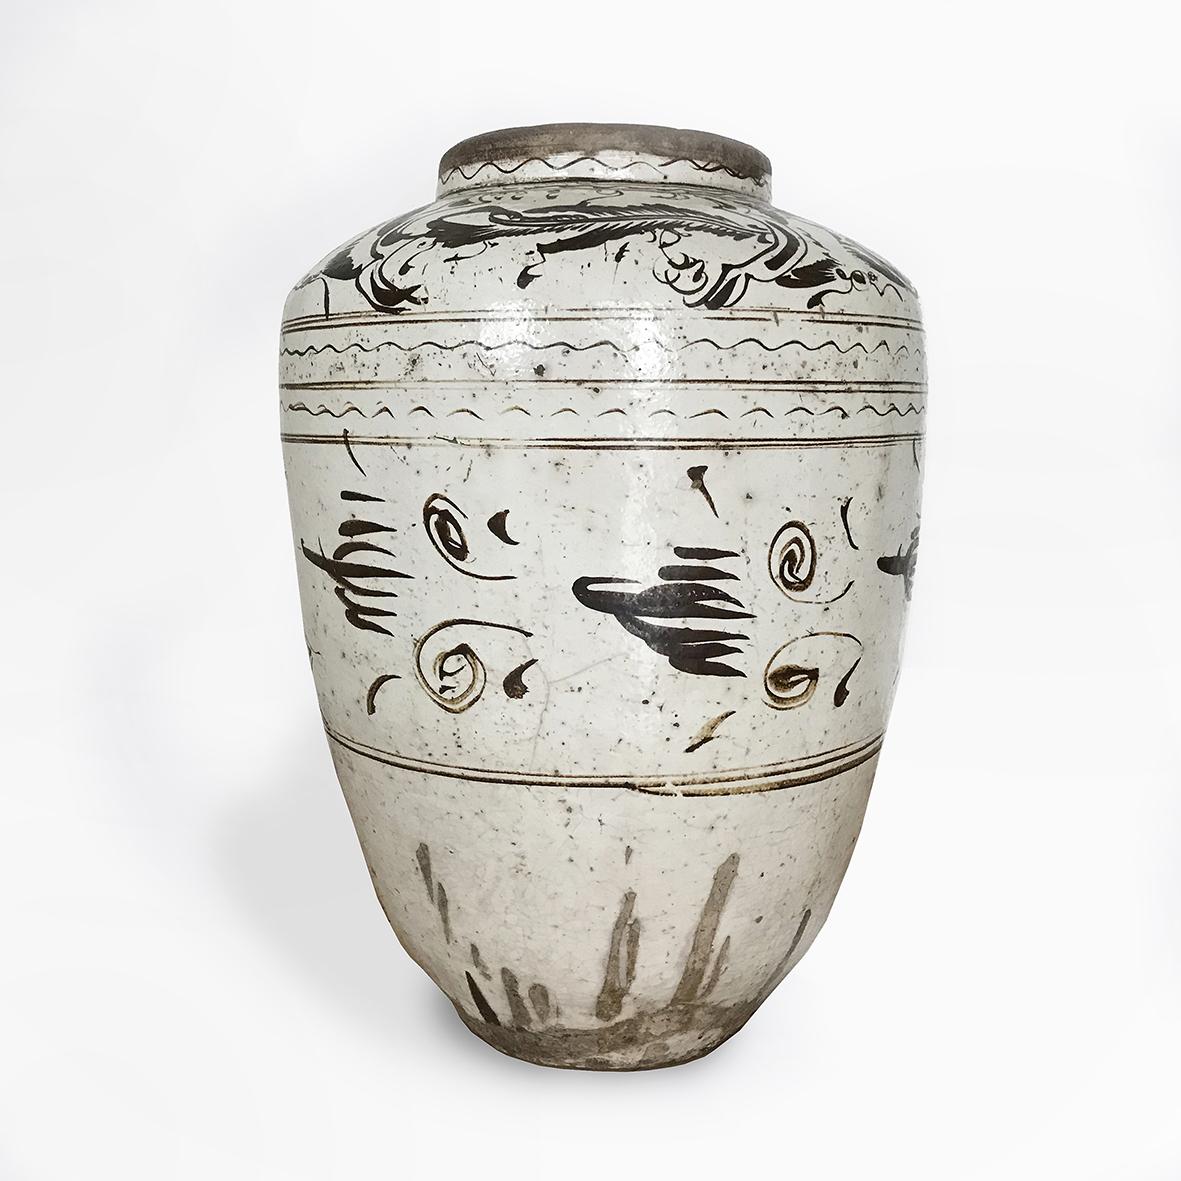 Huge Quingbai jar | ceramic | China | Ming Dynasty | basedonart gallery